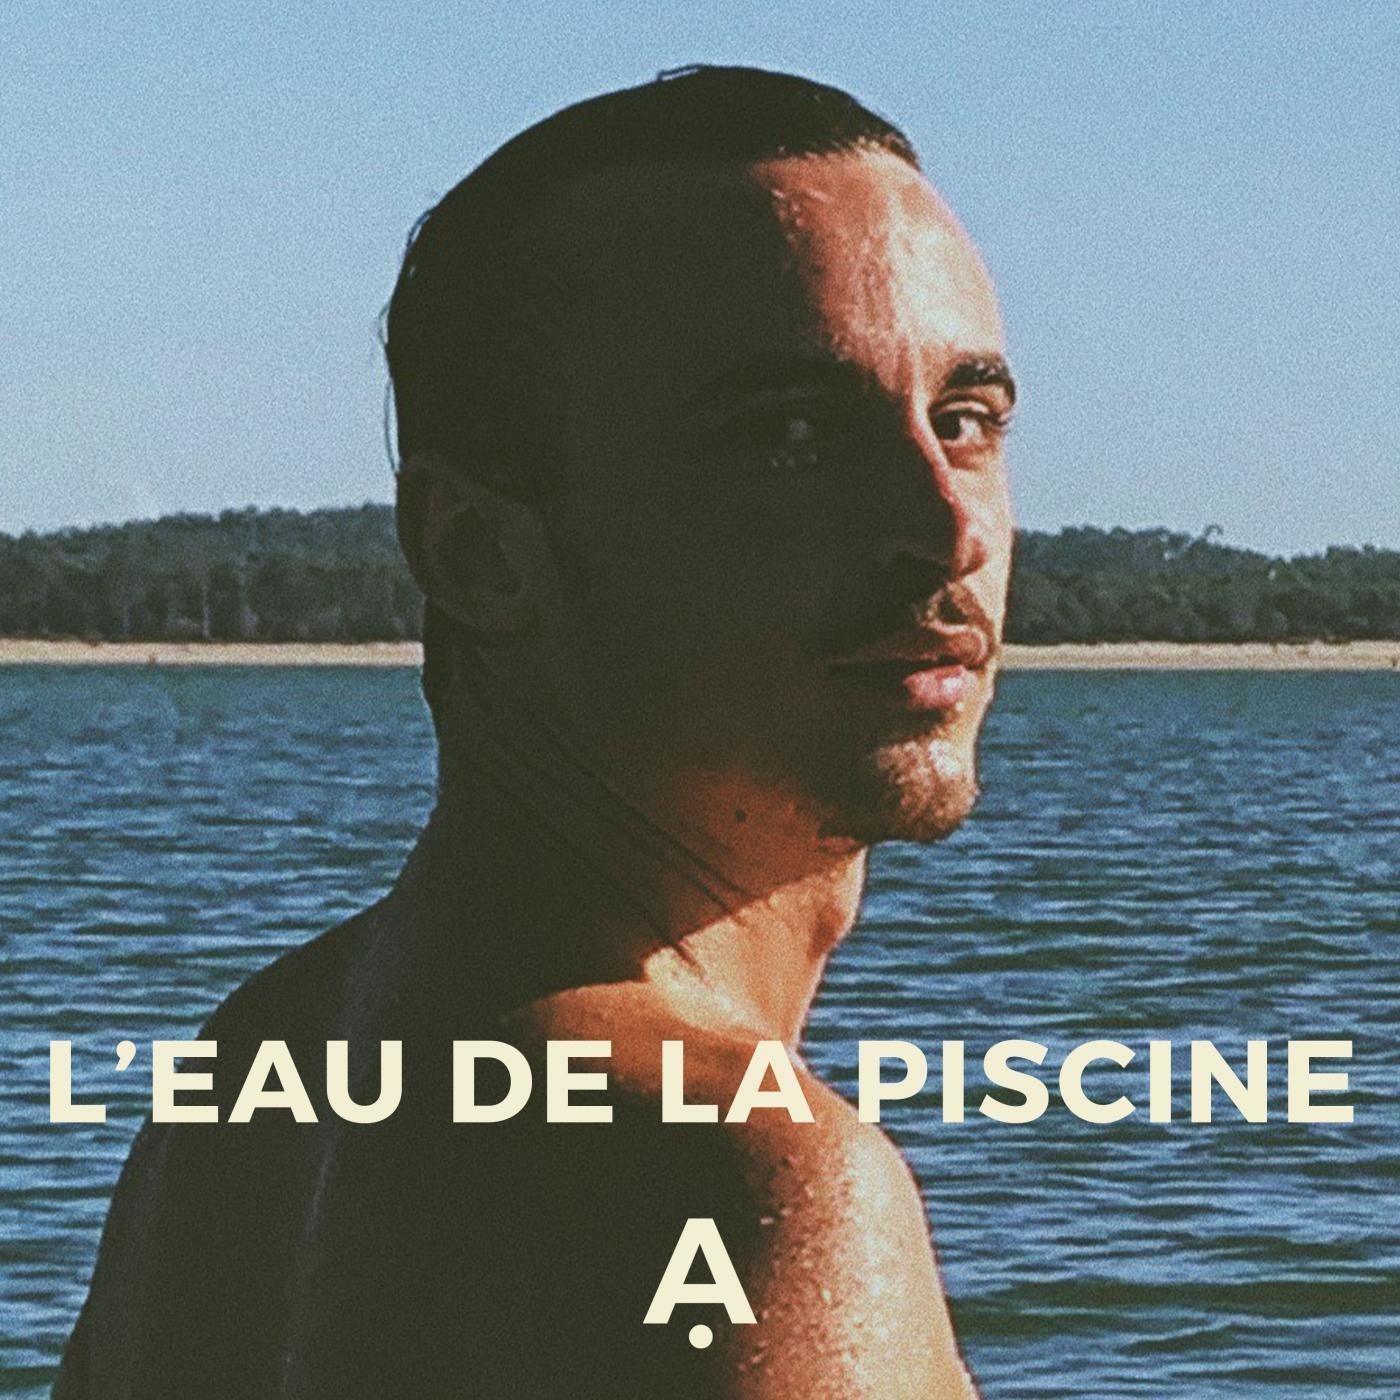 Aquariel : Artiste du Jour - 10 12 2020 - StereoChic Radio